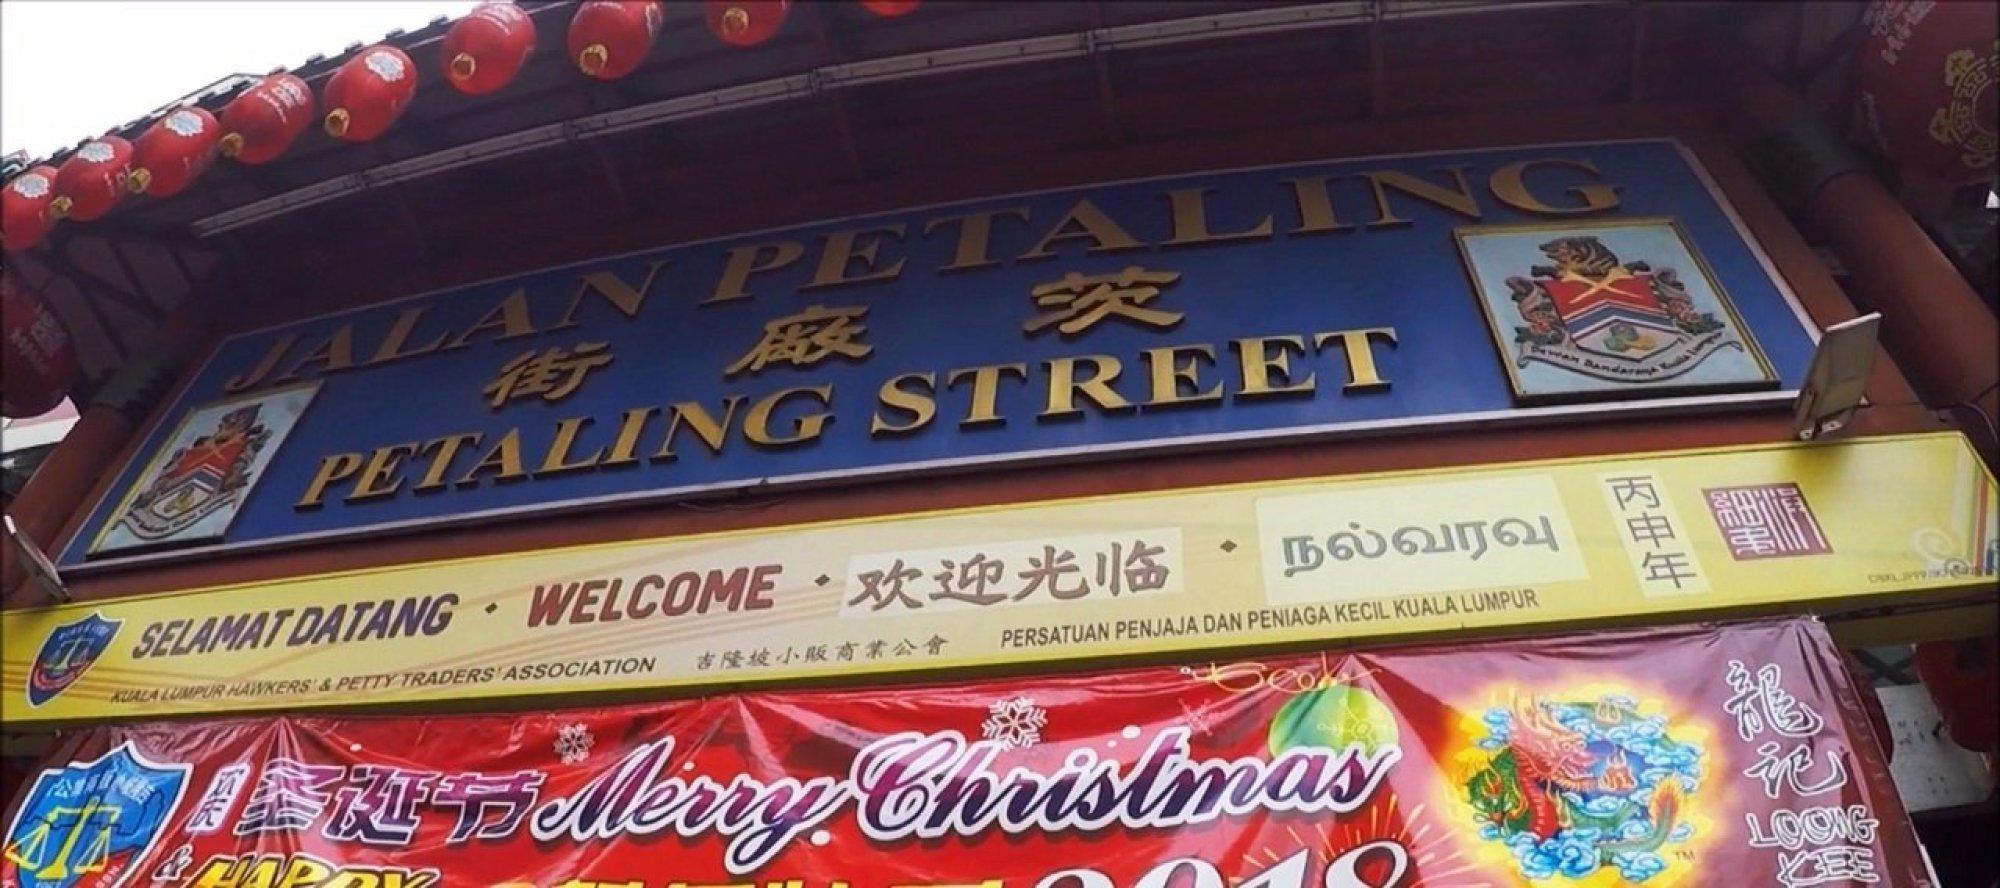 Things To Do In Kuala Lumpur - Petaling Street - Entrance